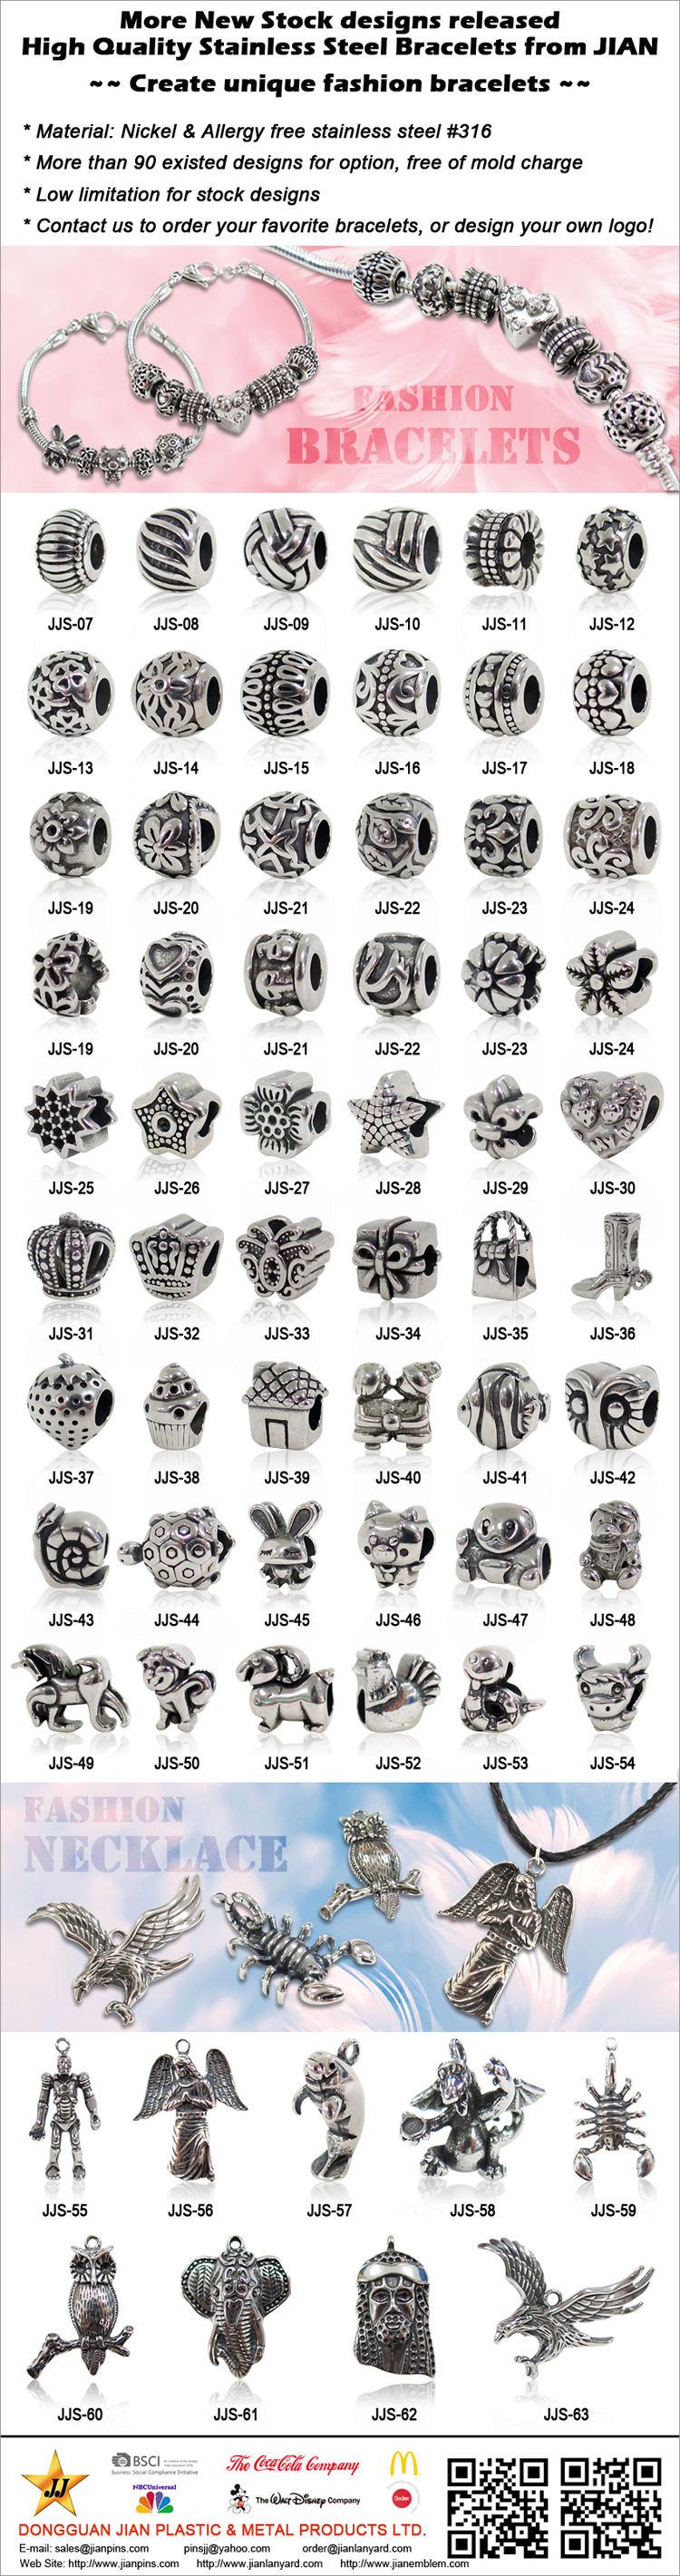 Fashion Stainless Steel Bracelets & Pendants